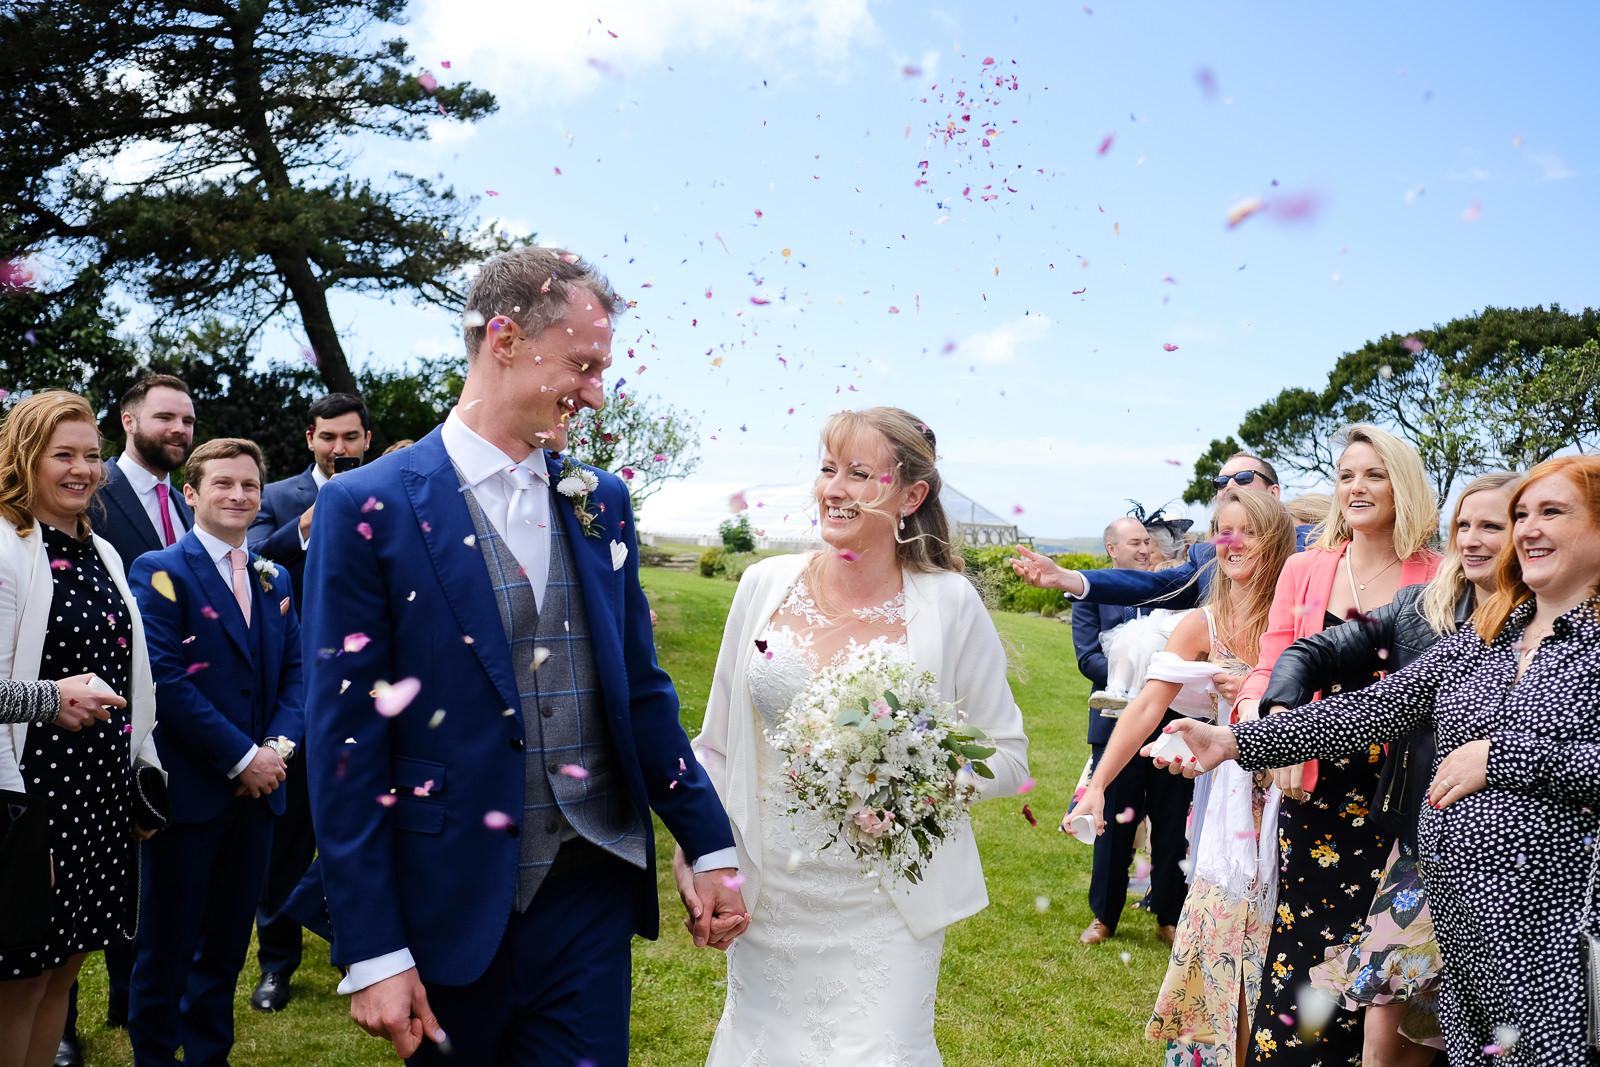 Roscarrock Farm wedding in Cornwall 039.jpg